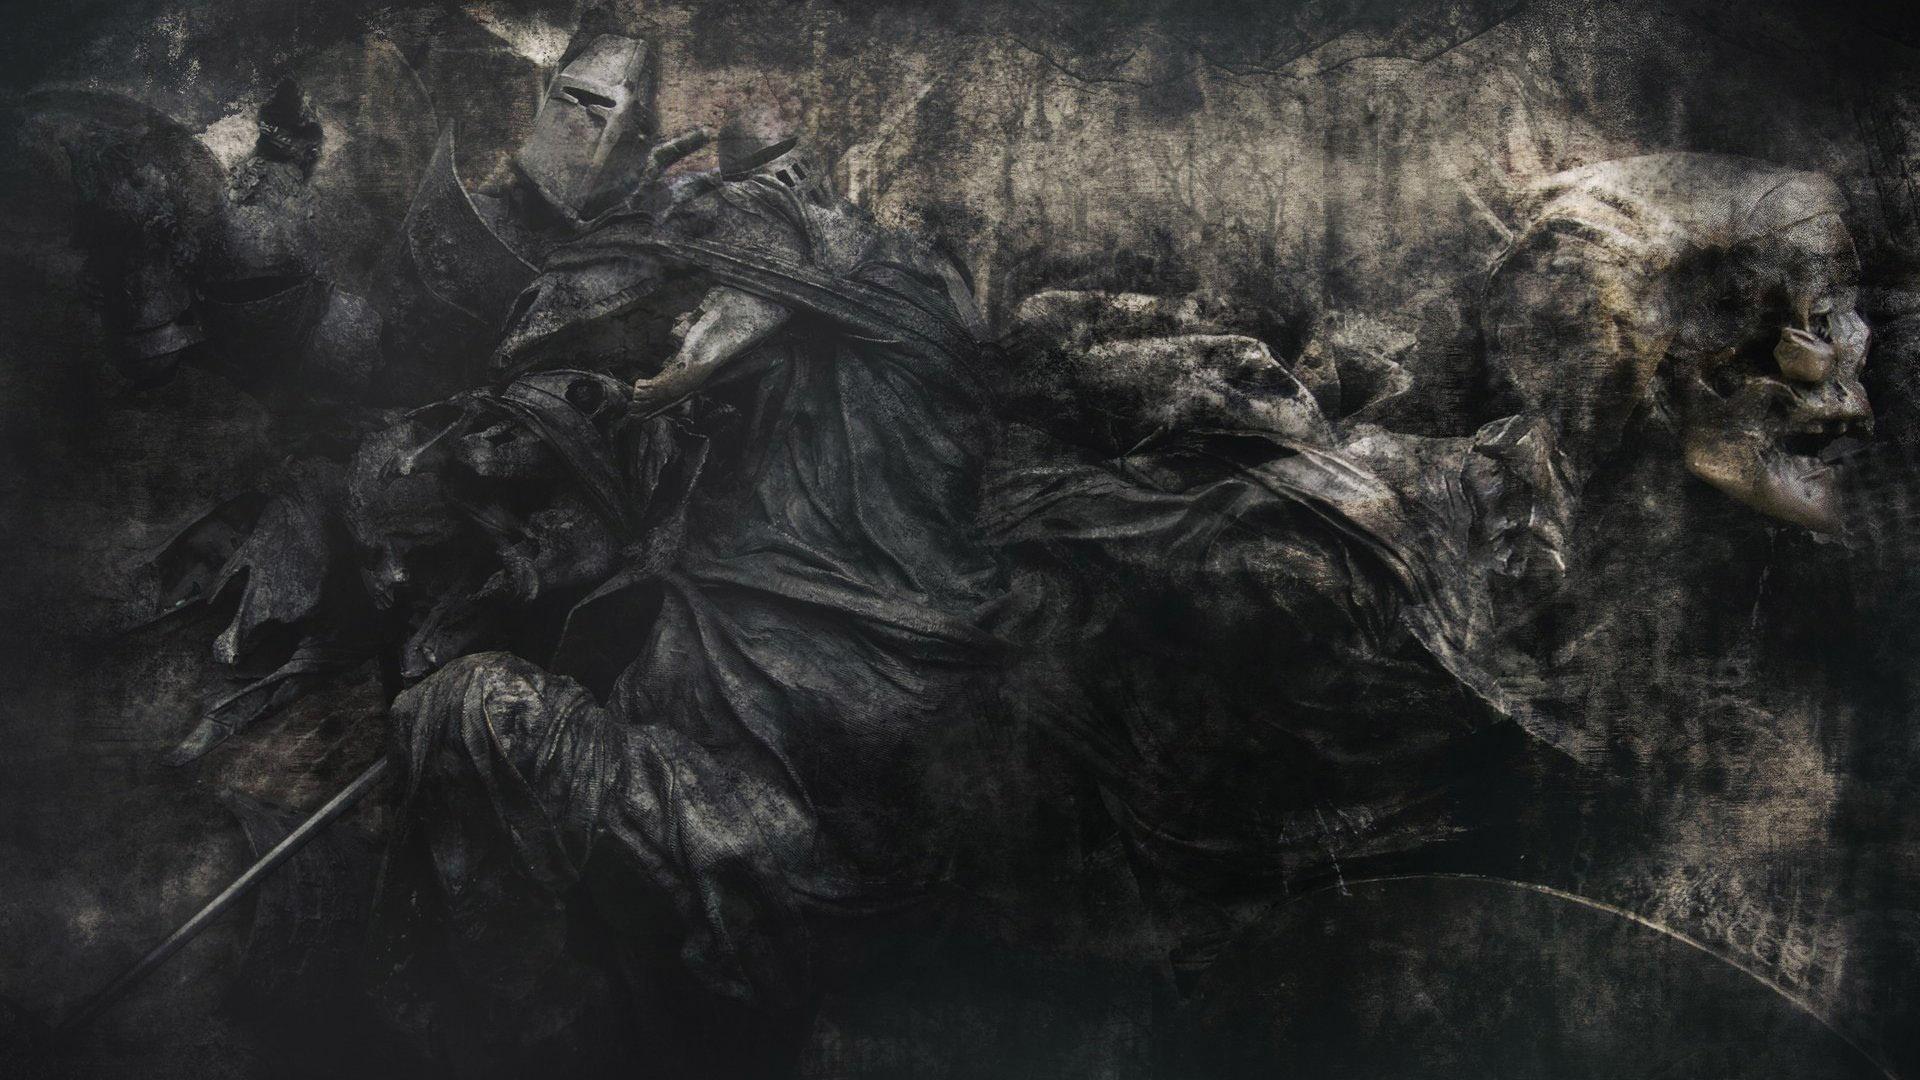 evil demon skulls wallpaper - photo #30